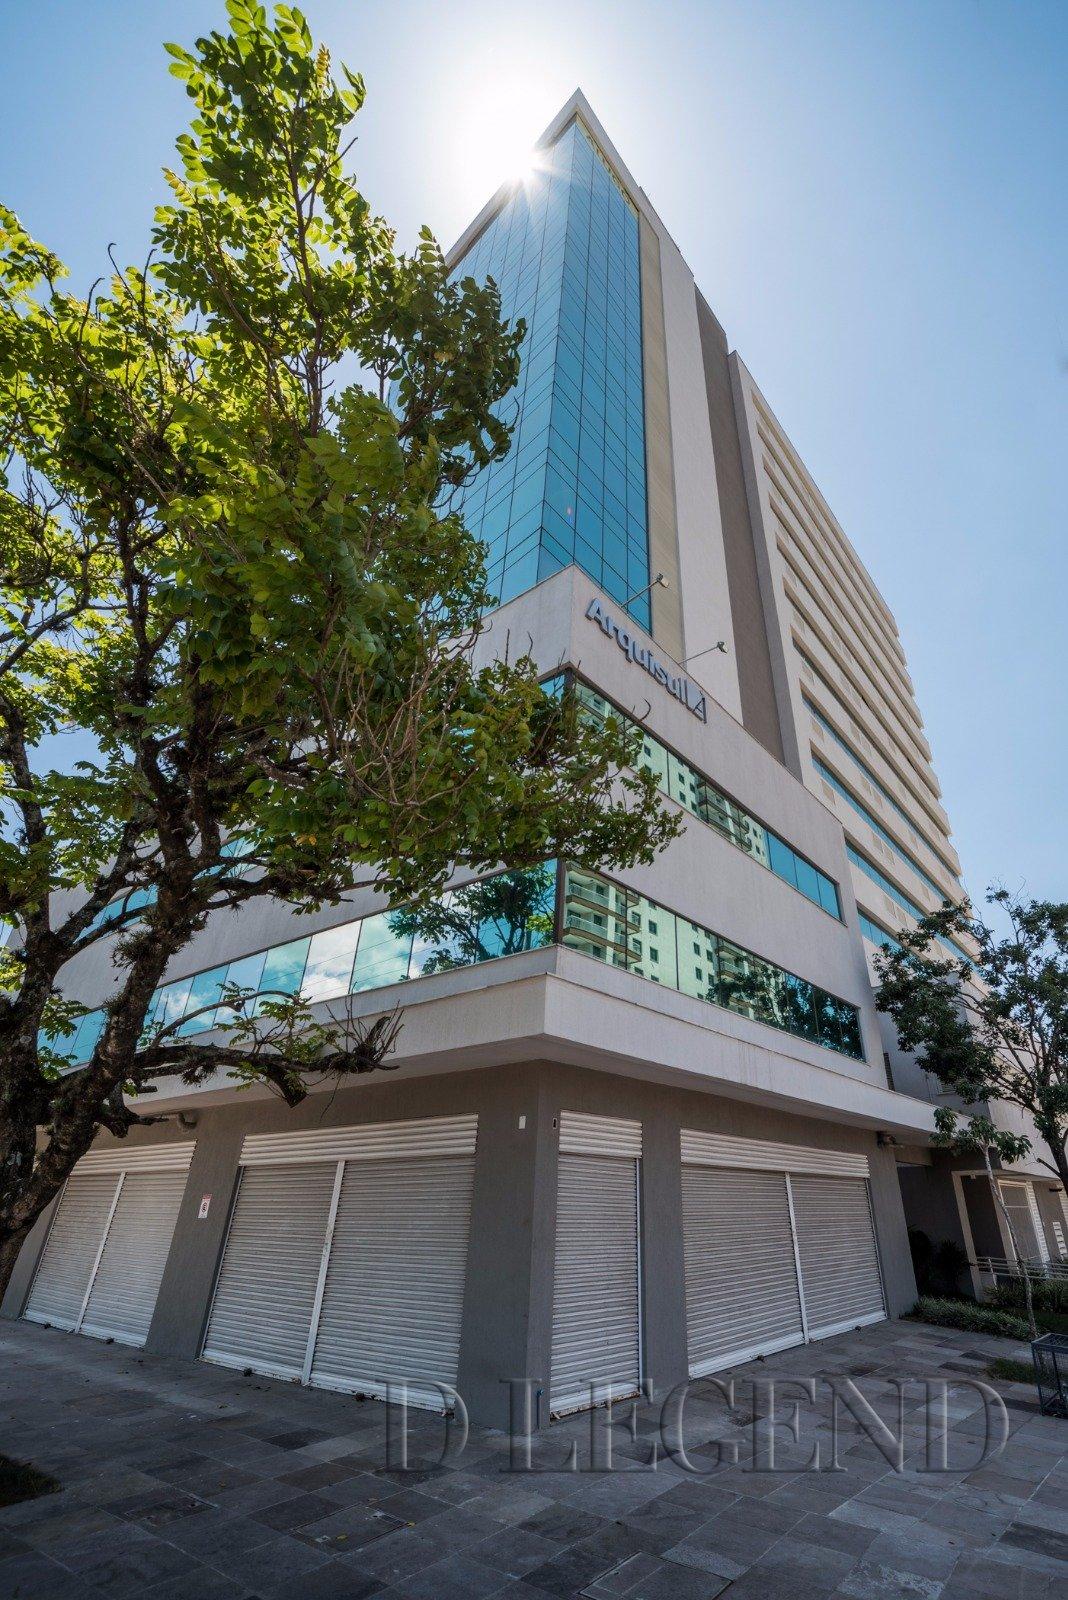 NEO SUPER QUADRA - Rua Santa Catarina, 40 - Santa Maria Goretti - Porto Alegre